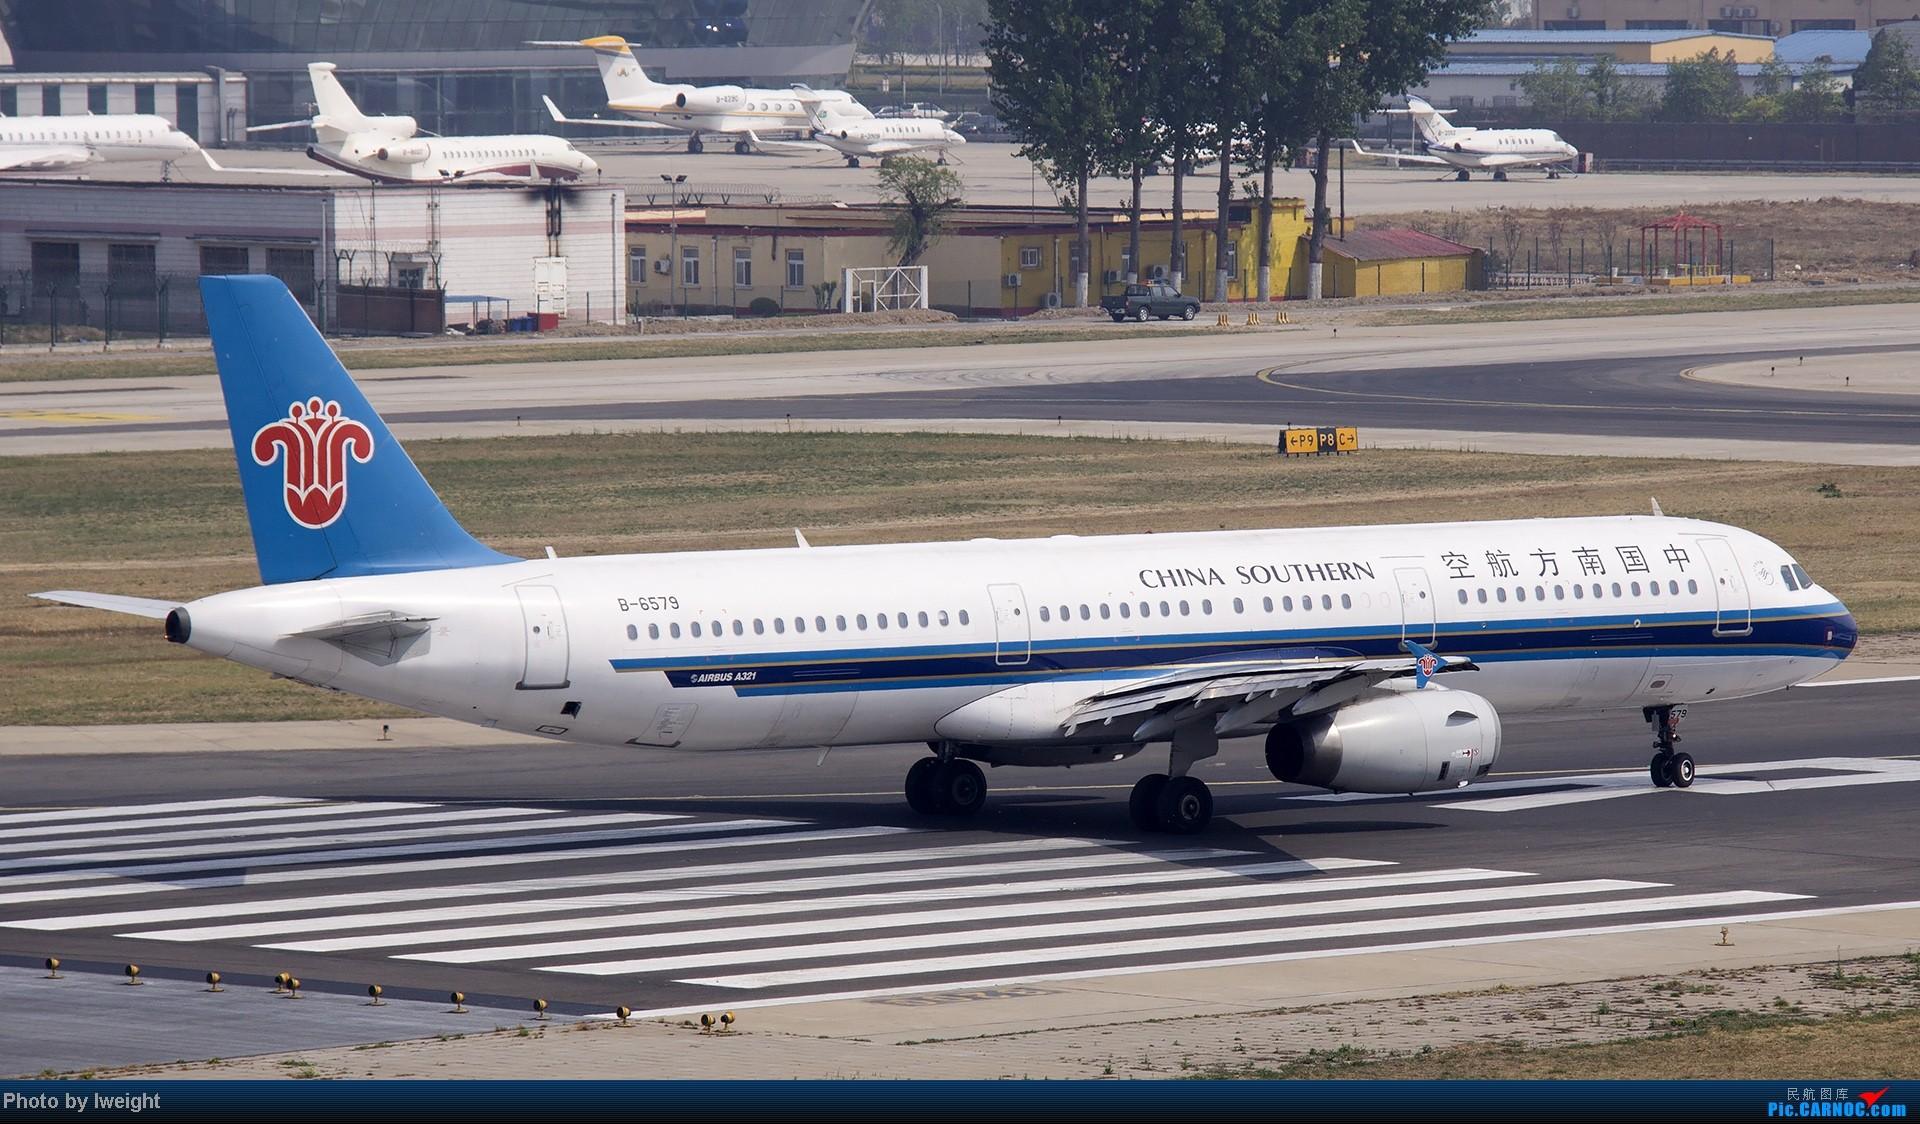 Re:[原创]错过了卡航的巴塞罗那号,只有这些大路货了,泪奔啊 AIRBUS A321-200 B-6579 中国北京首都机场